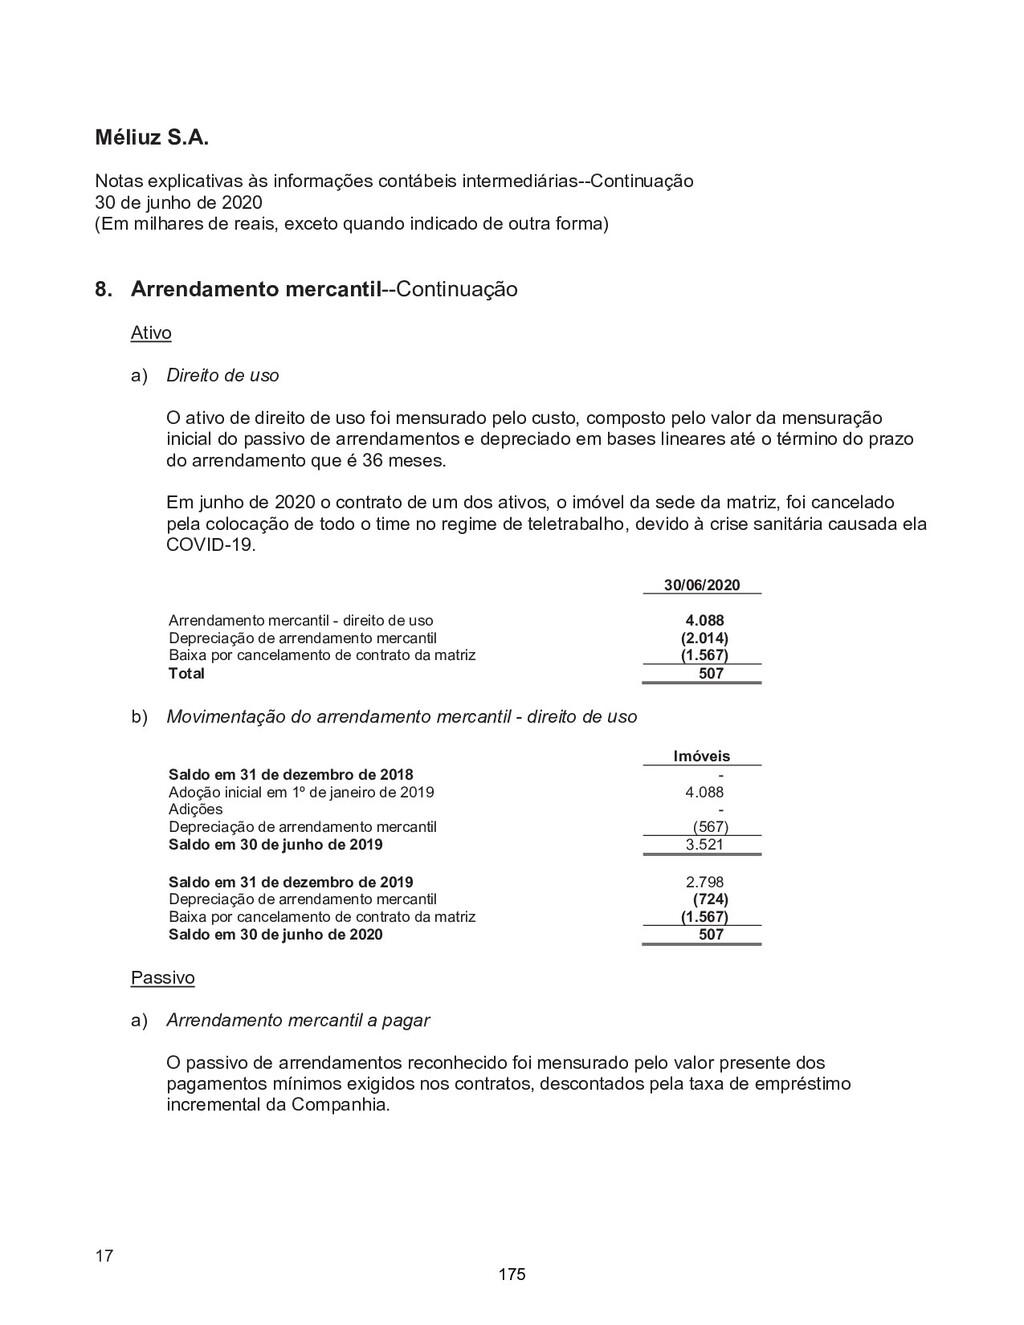 Méliuz S.A. Notas explicativas às informações c...